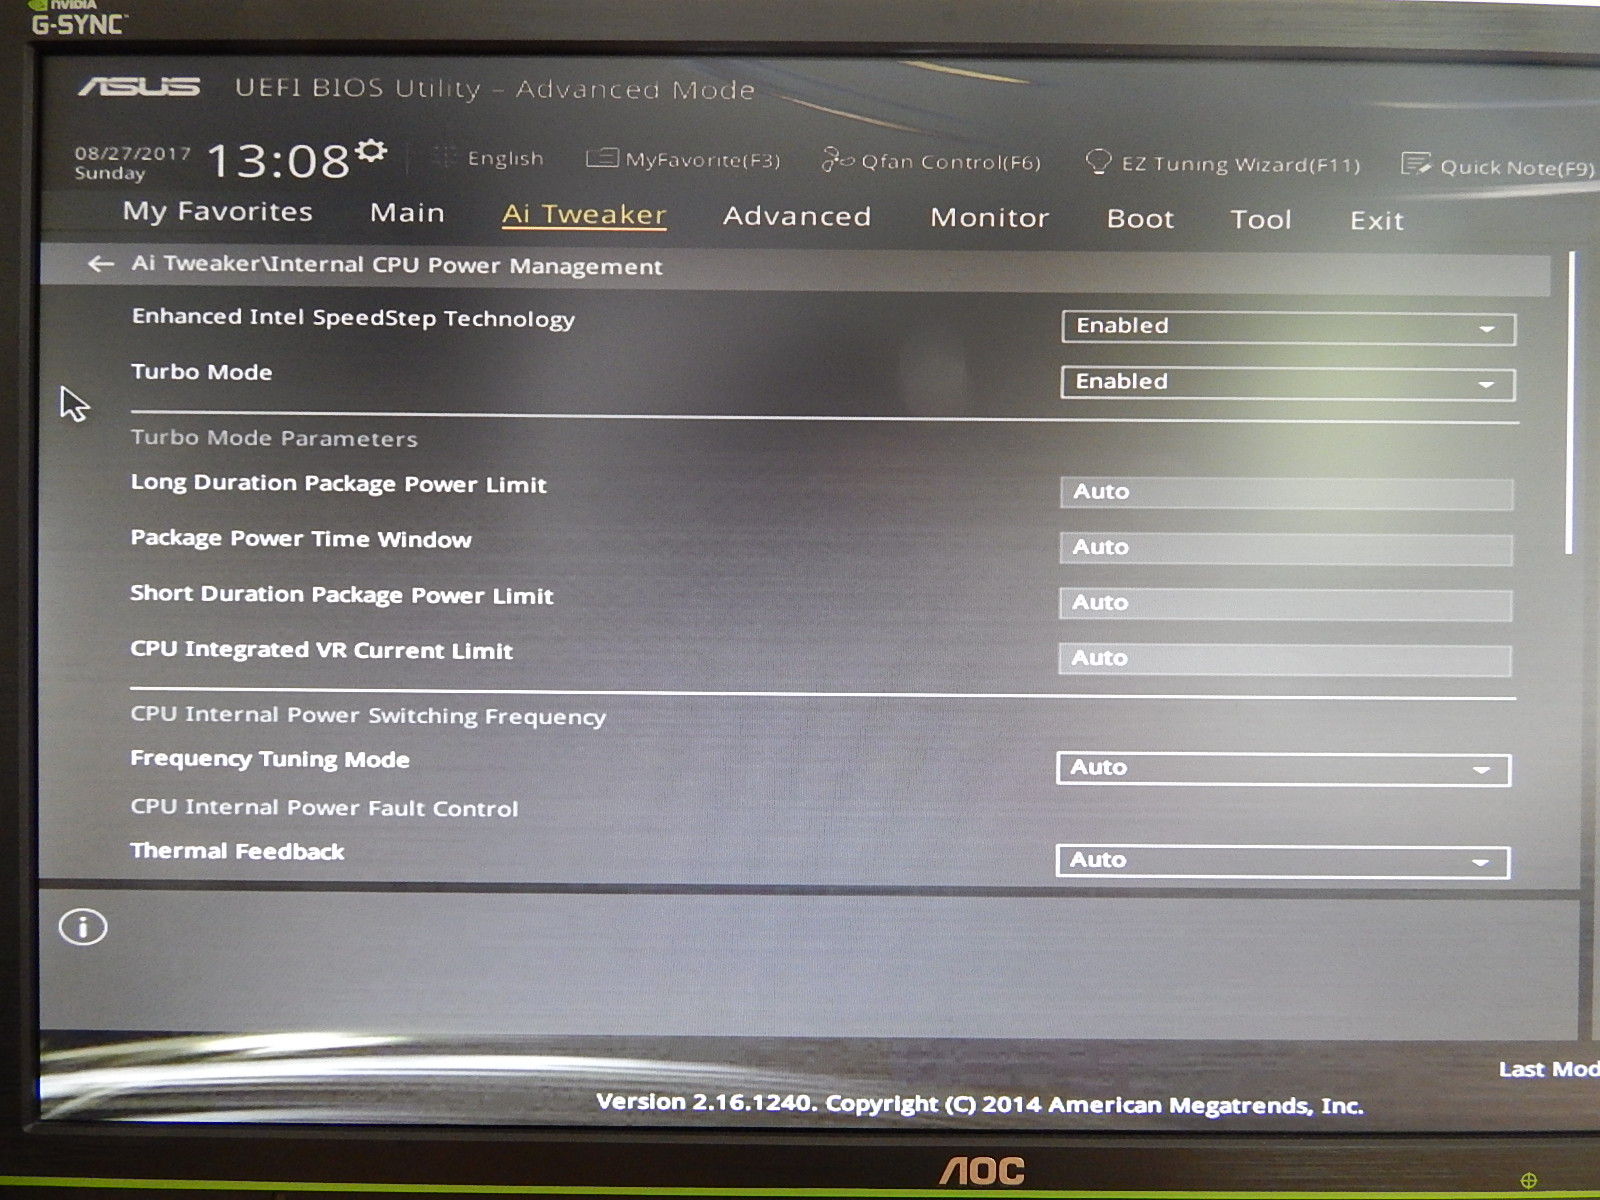 OC: I5 4690K limitiert bei 3700Mhz trotz höherem Multiplikator